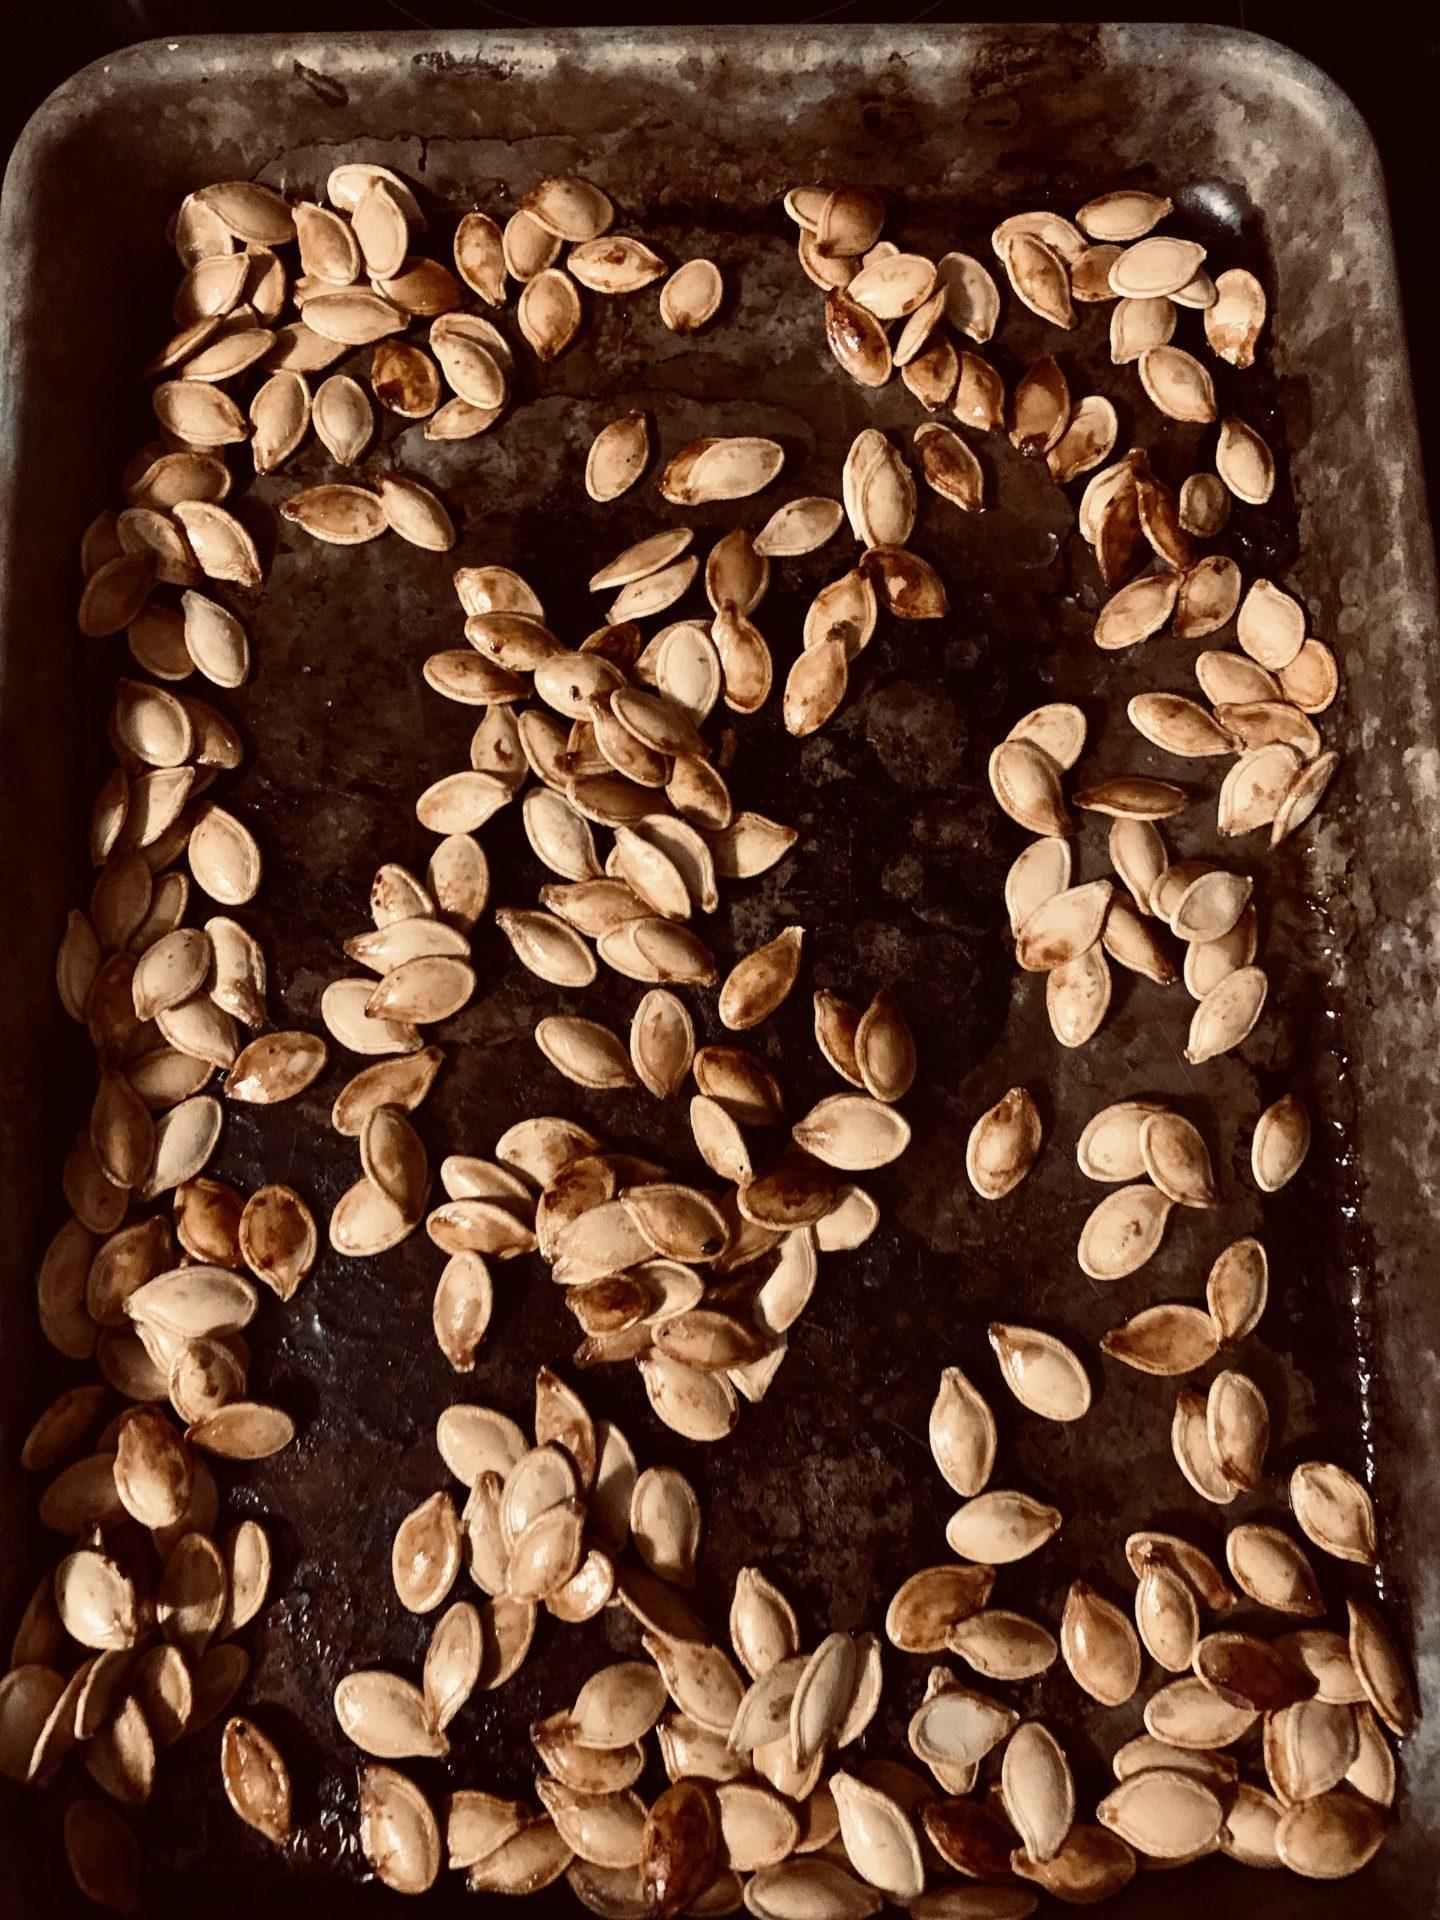 Sweet Sugary Pumpkin Seeds – Best eaten warm